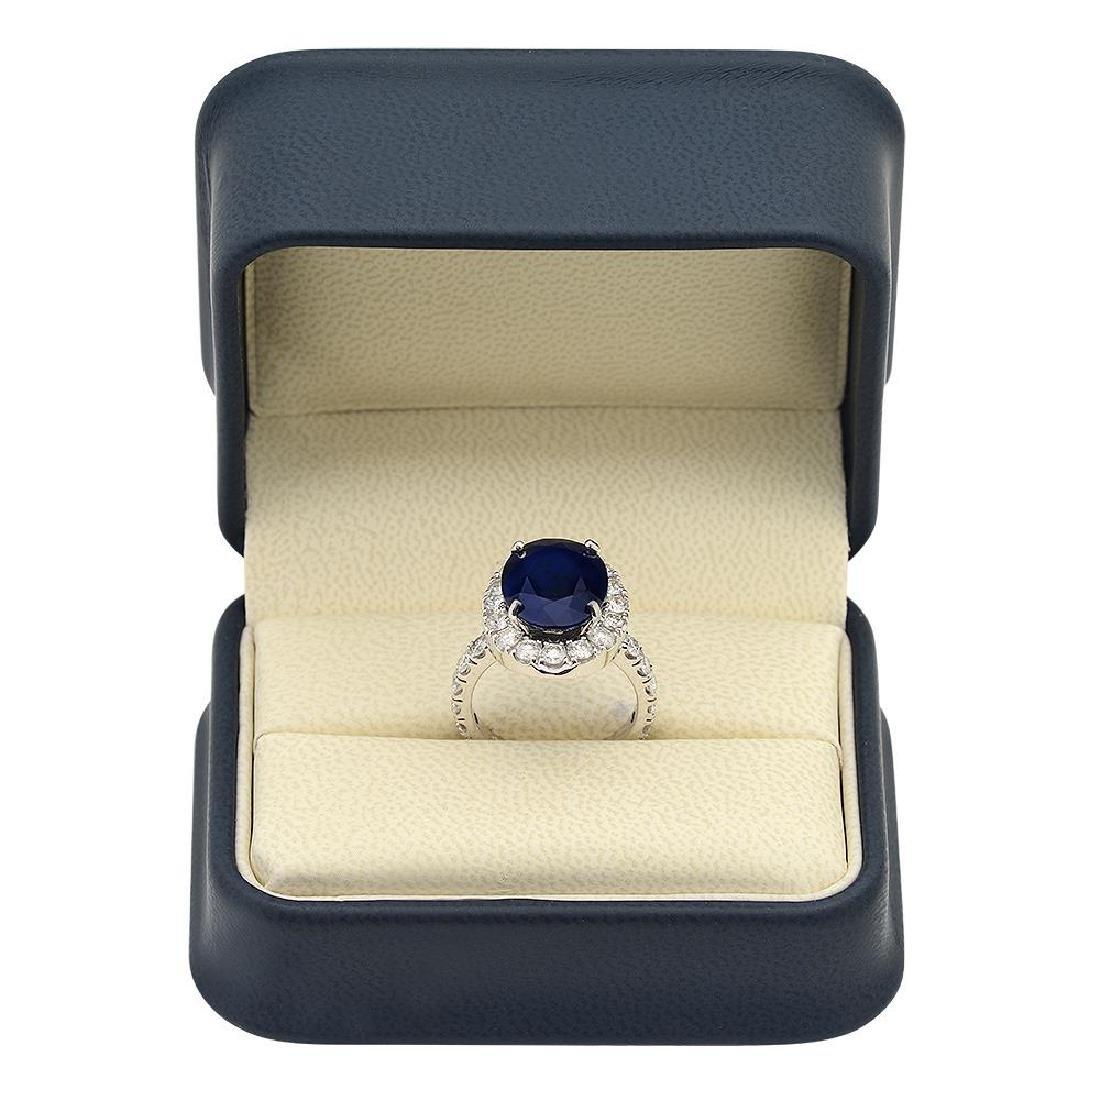 14K Gold 8.00ct Sapphire 2.00ct Diamond Ring - 4